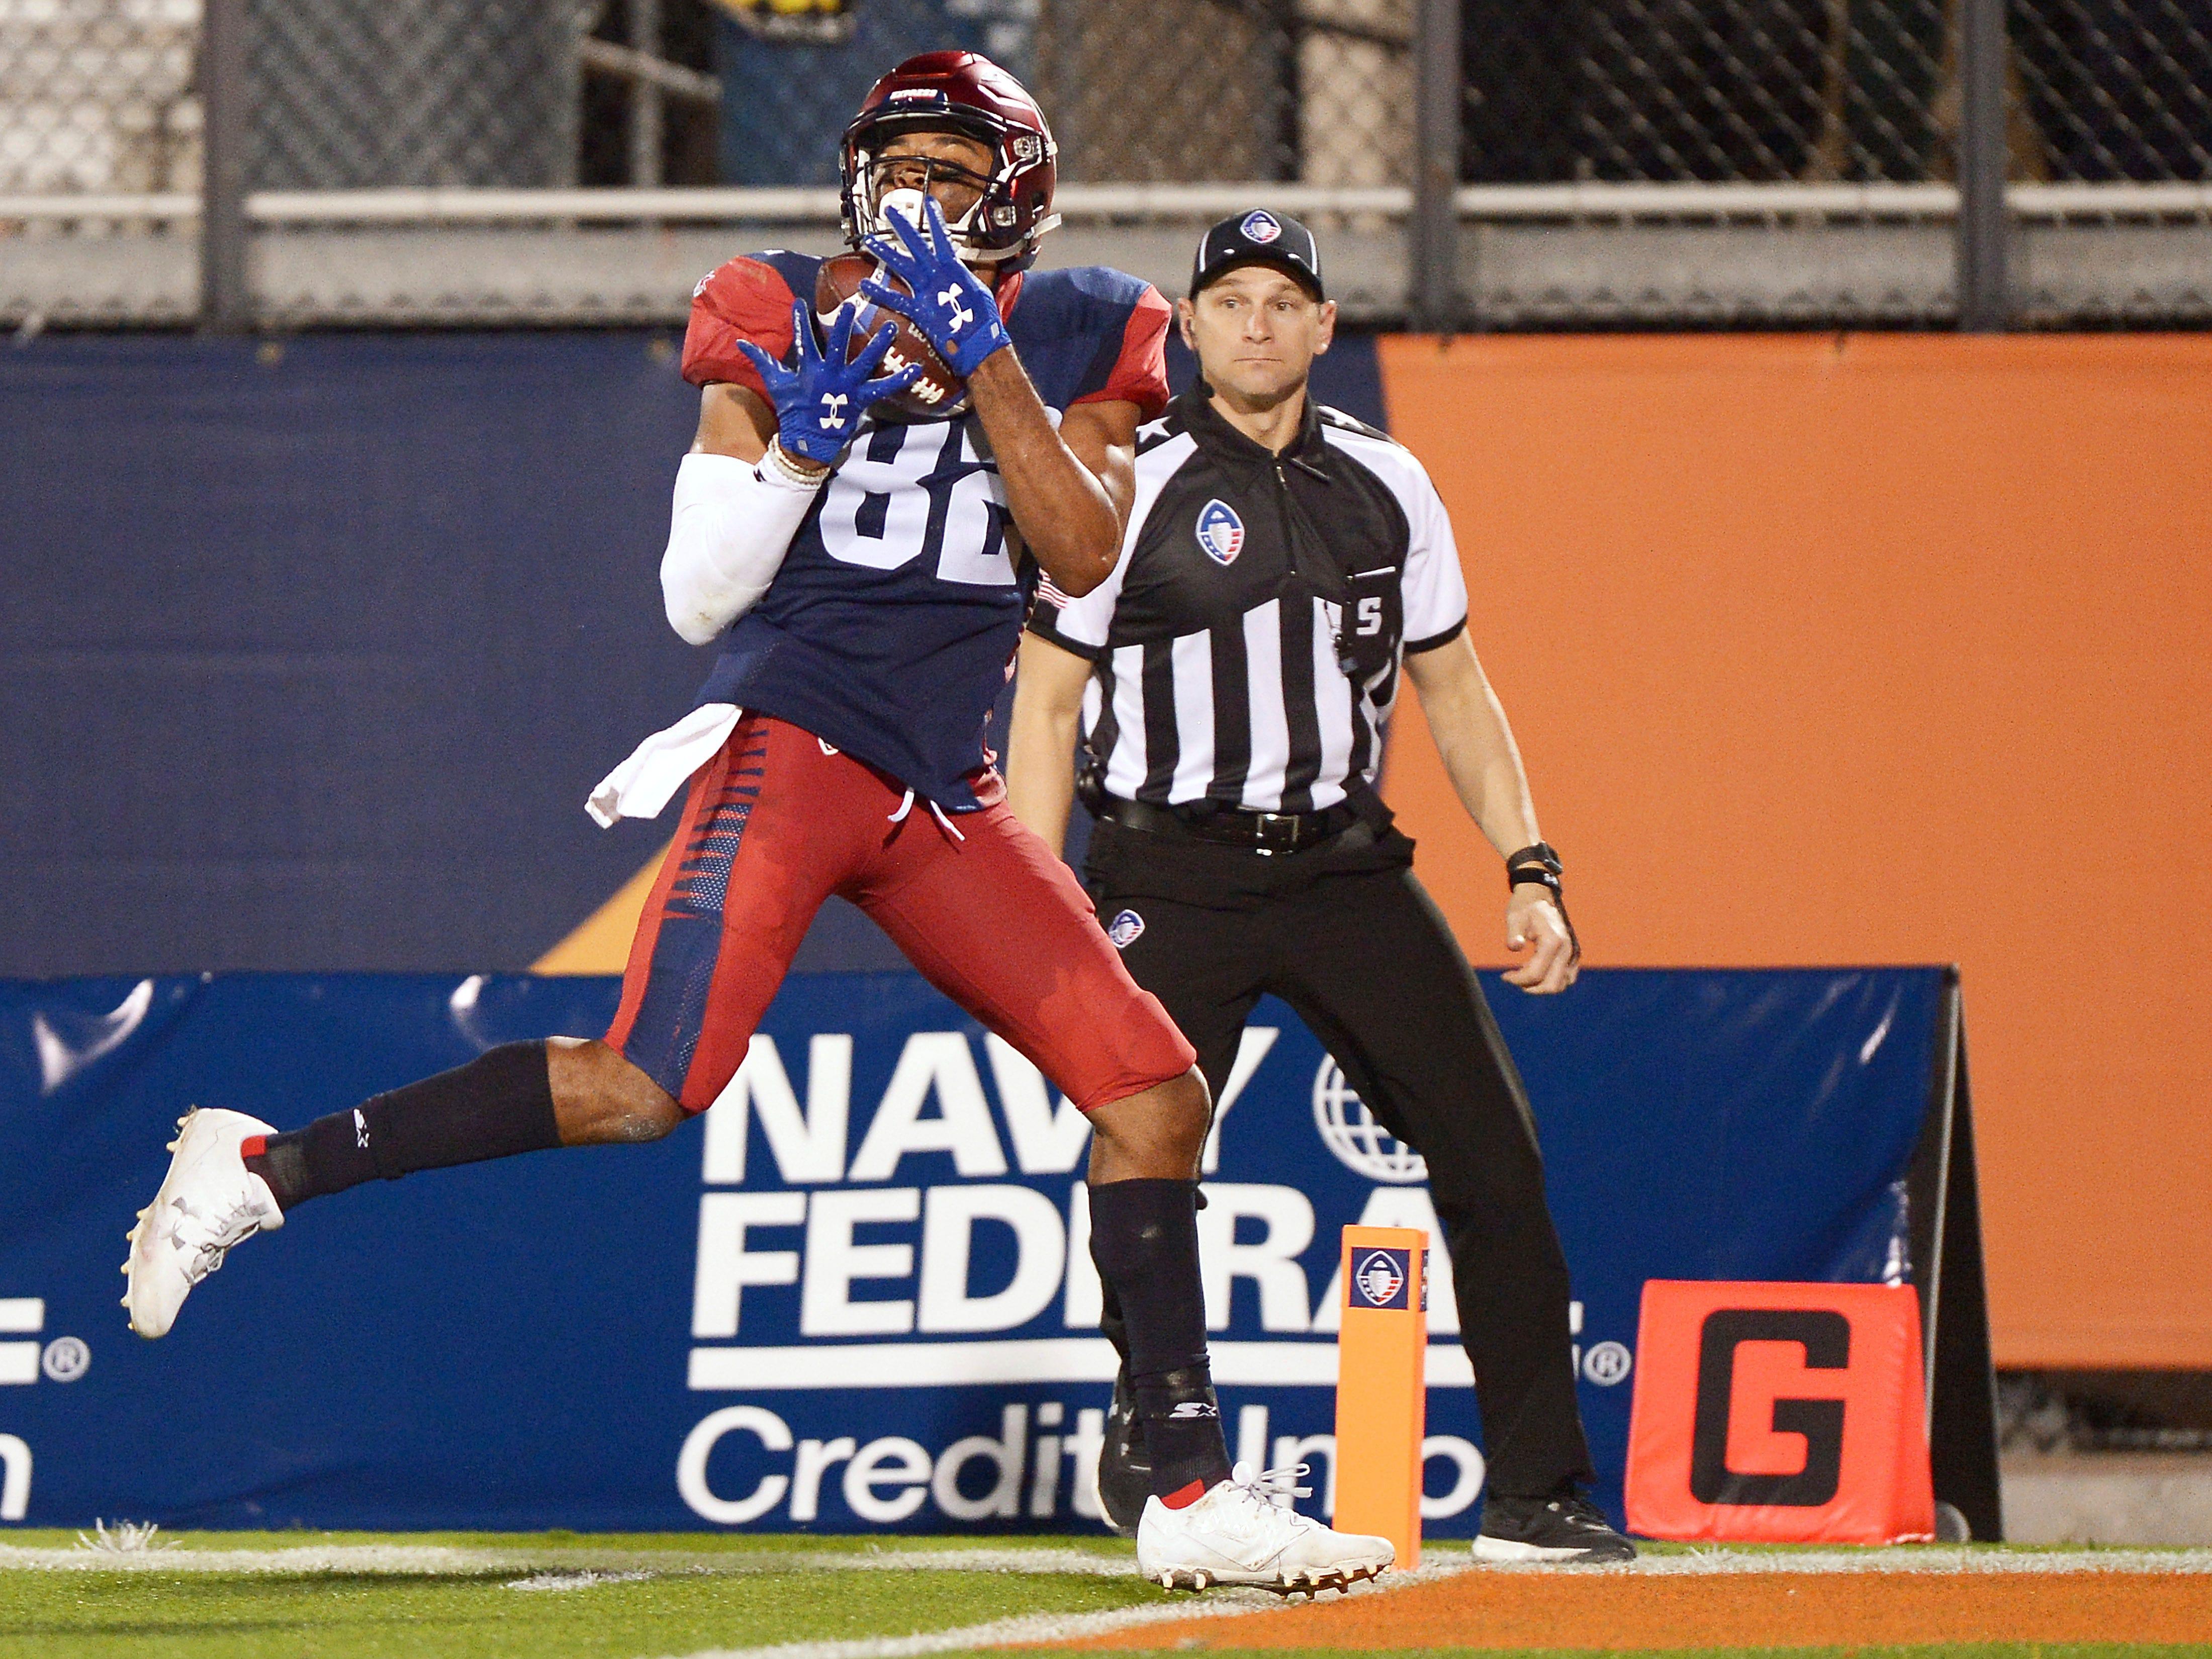 Memphis Express receiver Gerrard Sheppard (82) hauls in a fourth quarter touchdown catch against the Orlando Apollos.